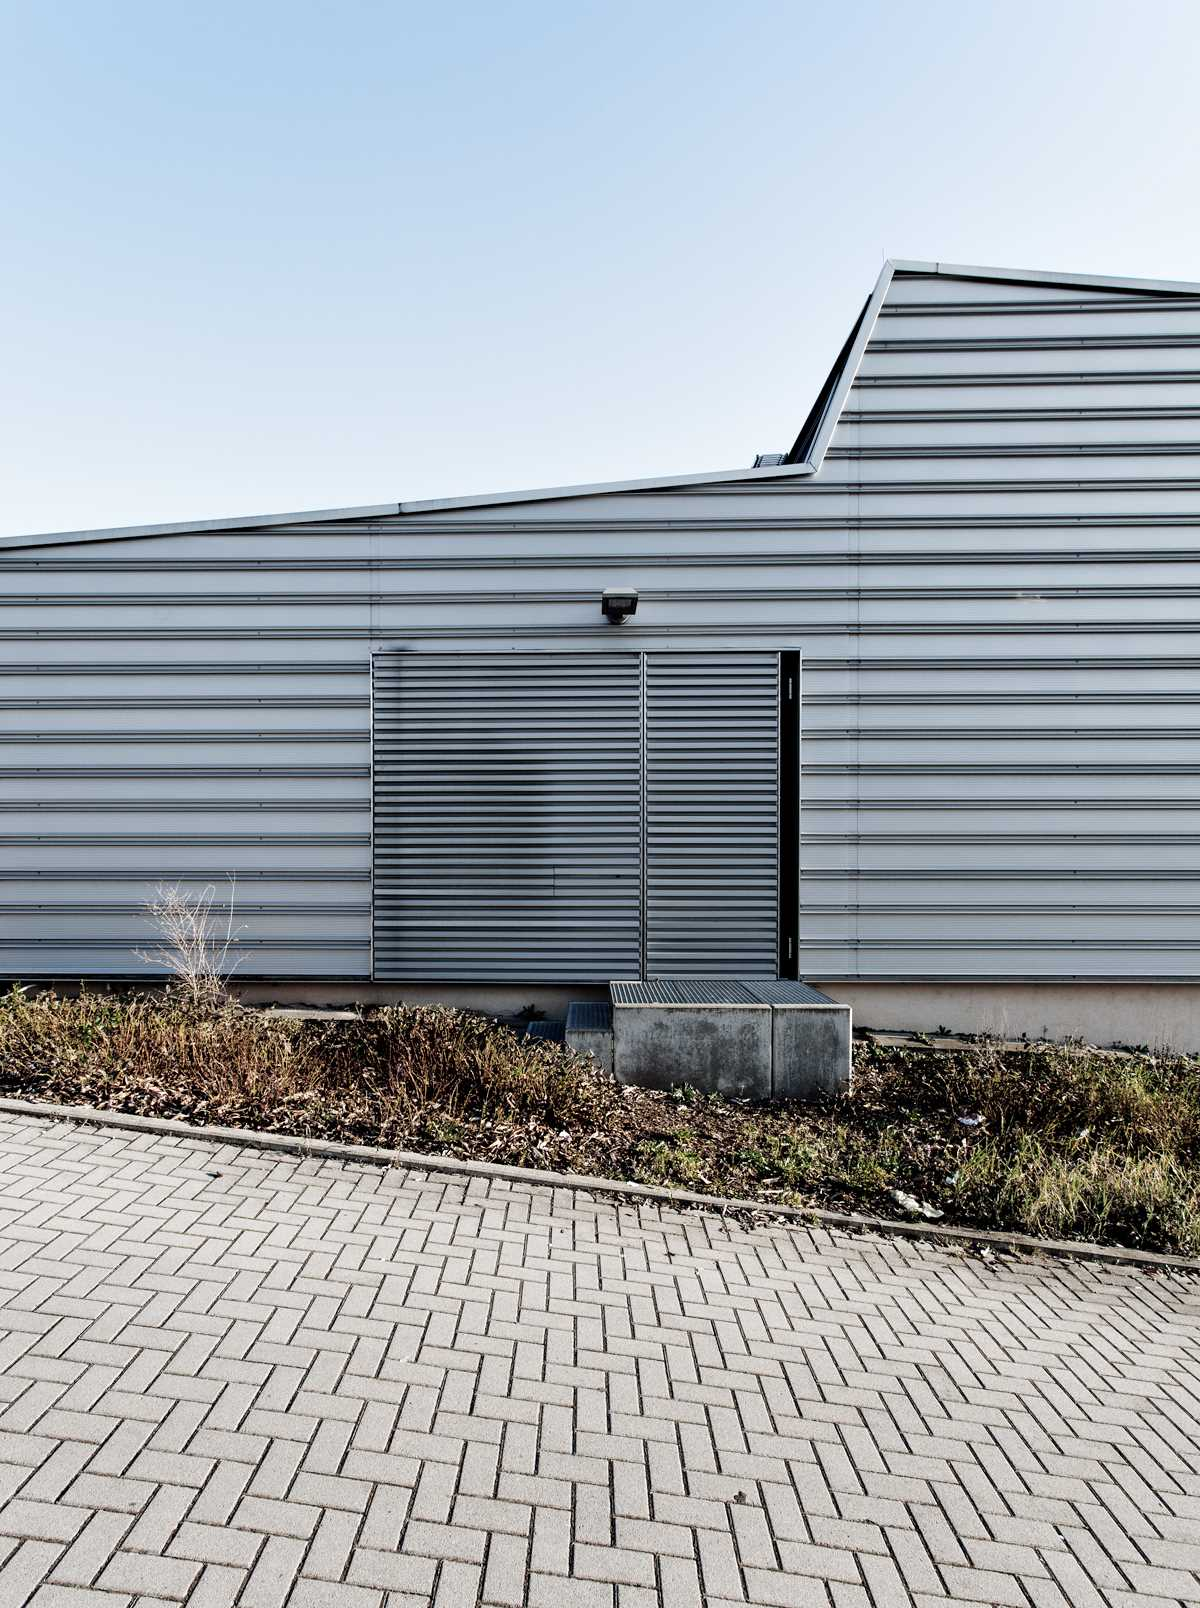 Suburban Minimalism by Malte Grüner